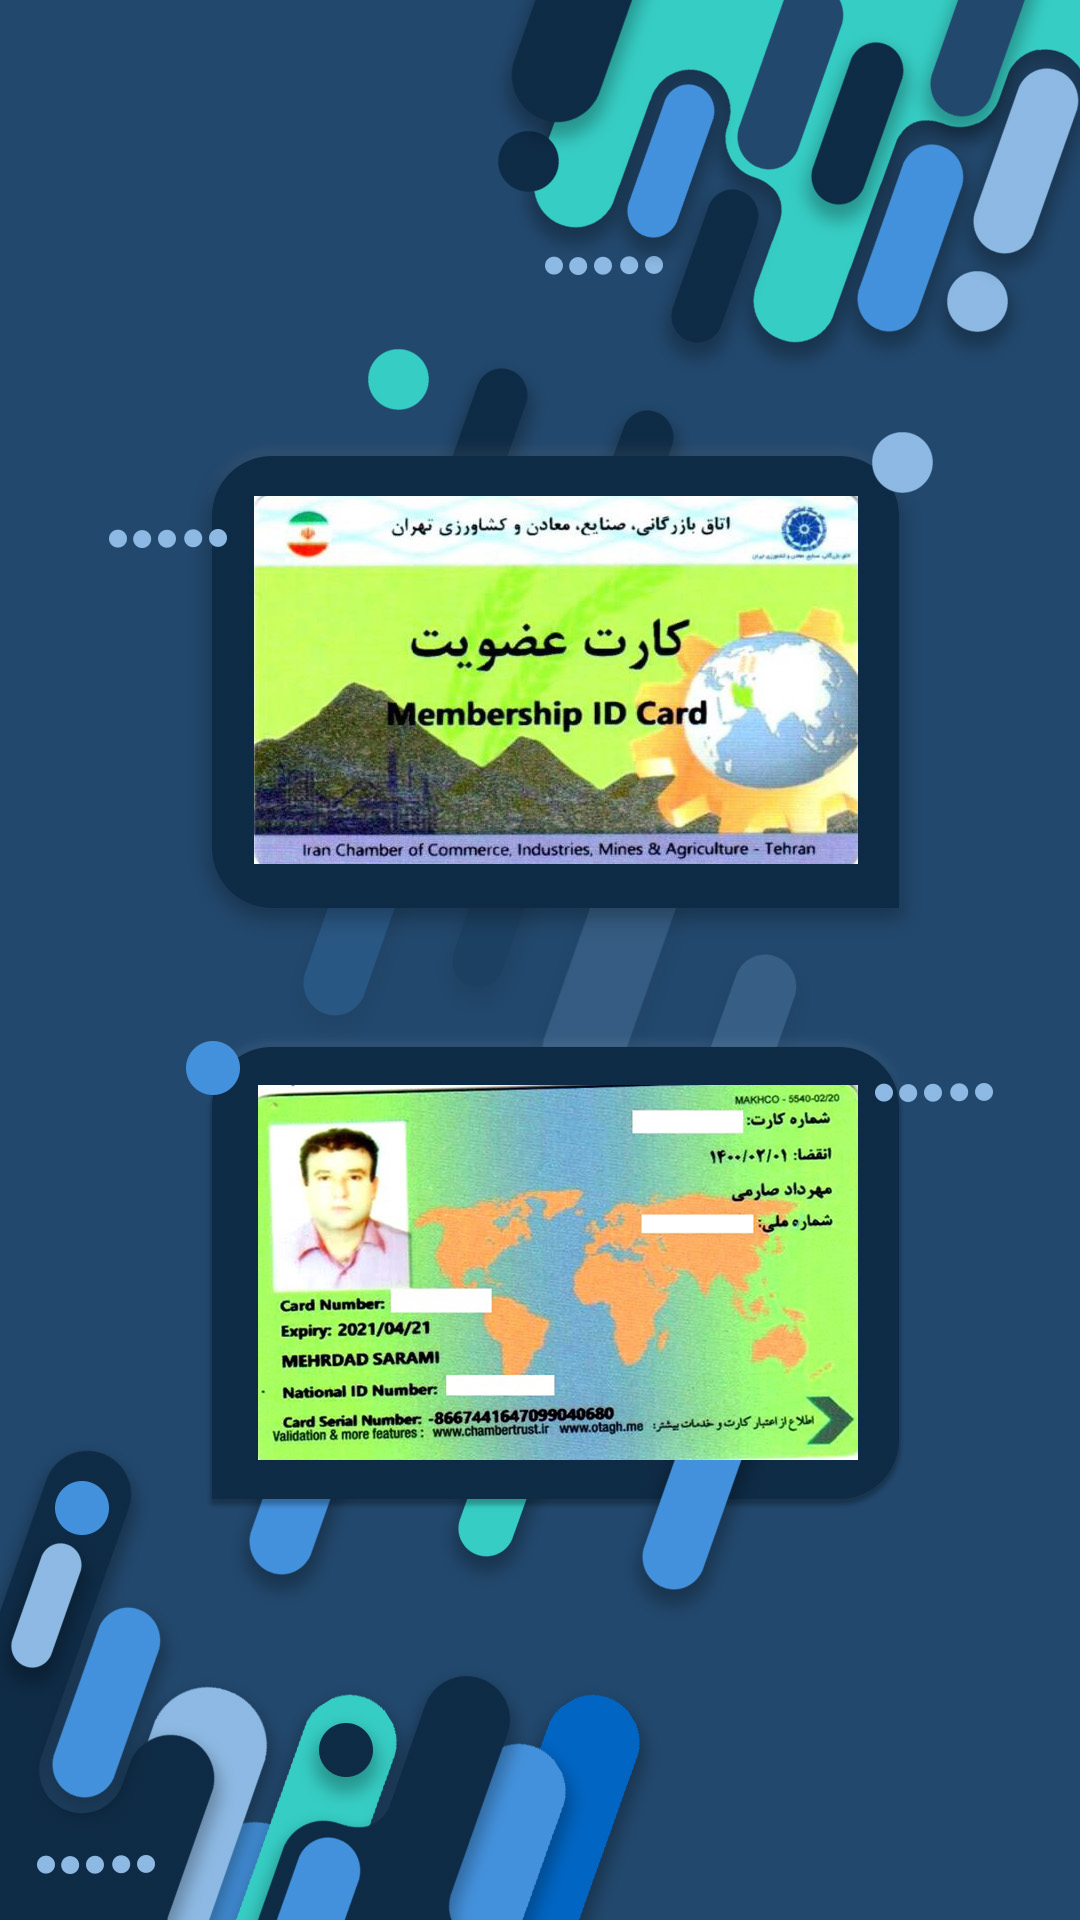 mahan-card-joind-.5-3999